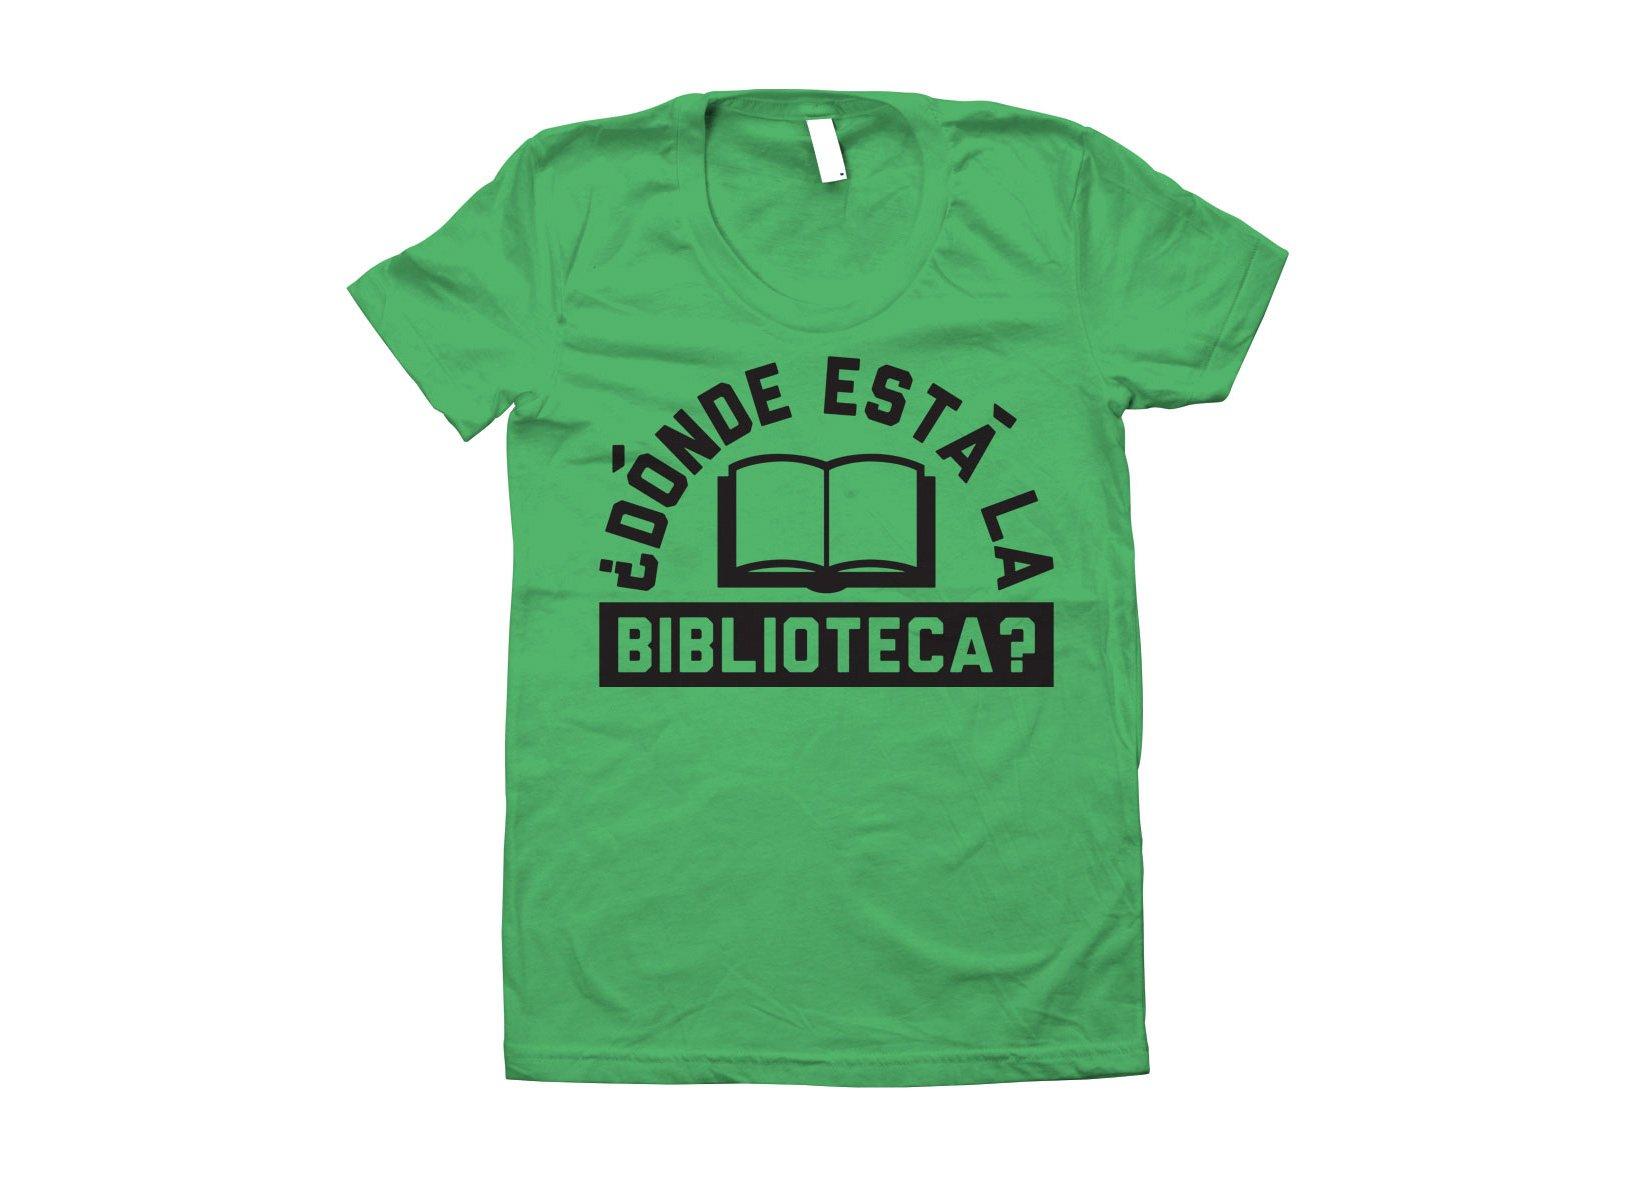 Donde Esta La Biblioteca? on Juniors T-Shirt